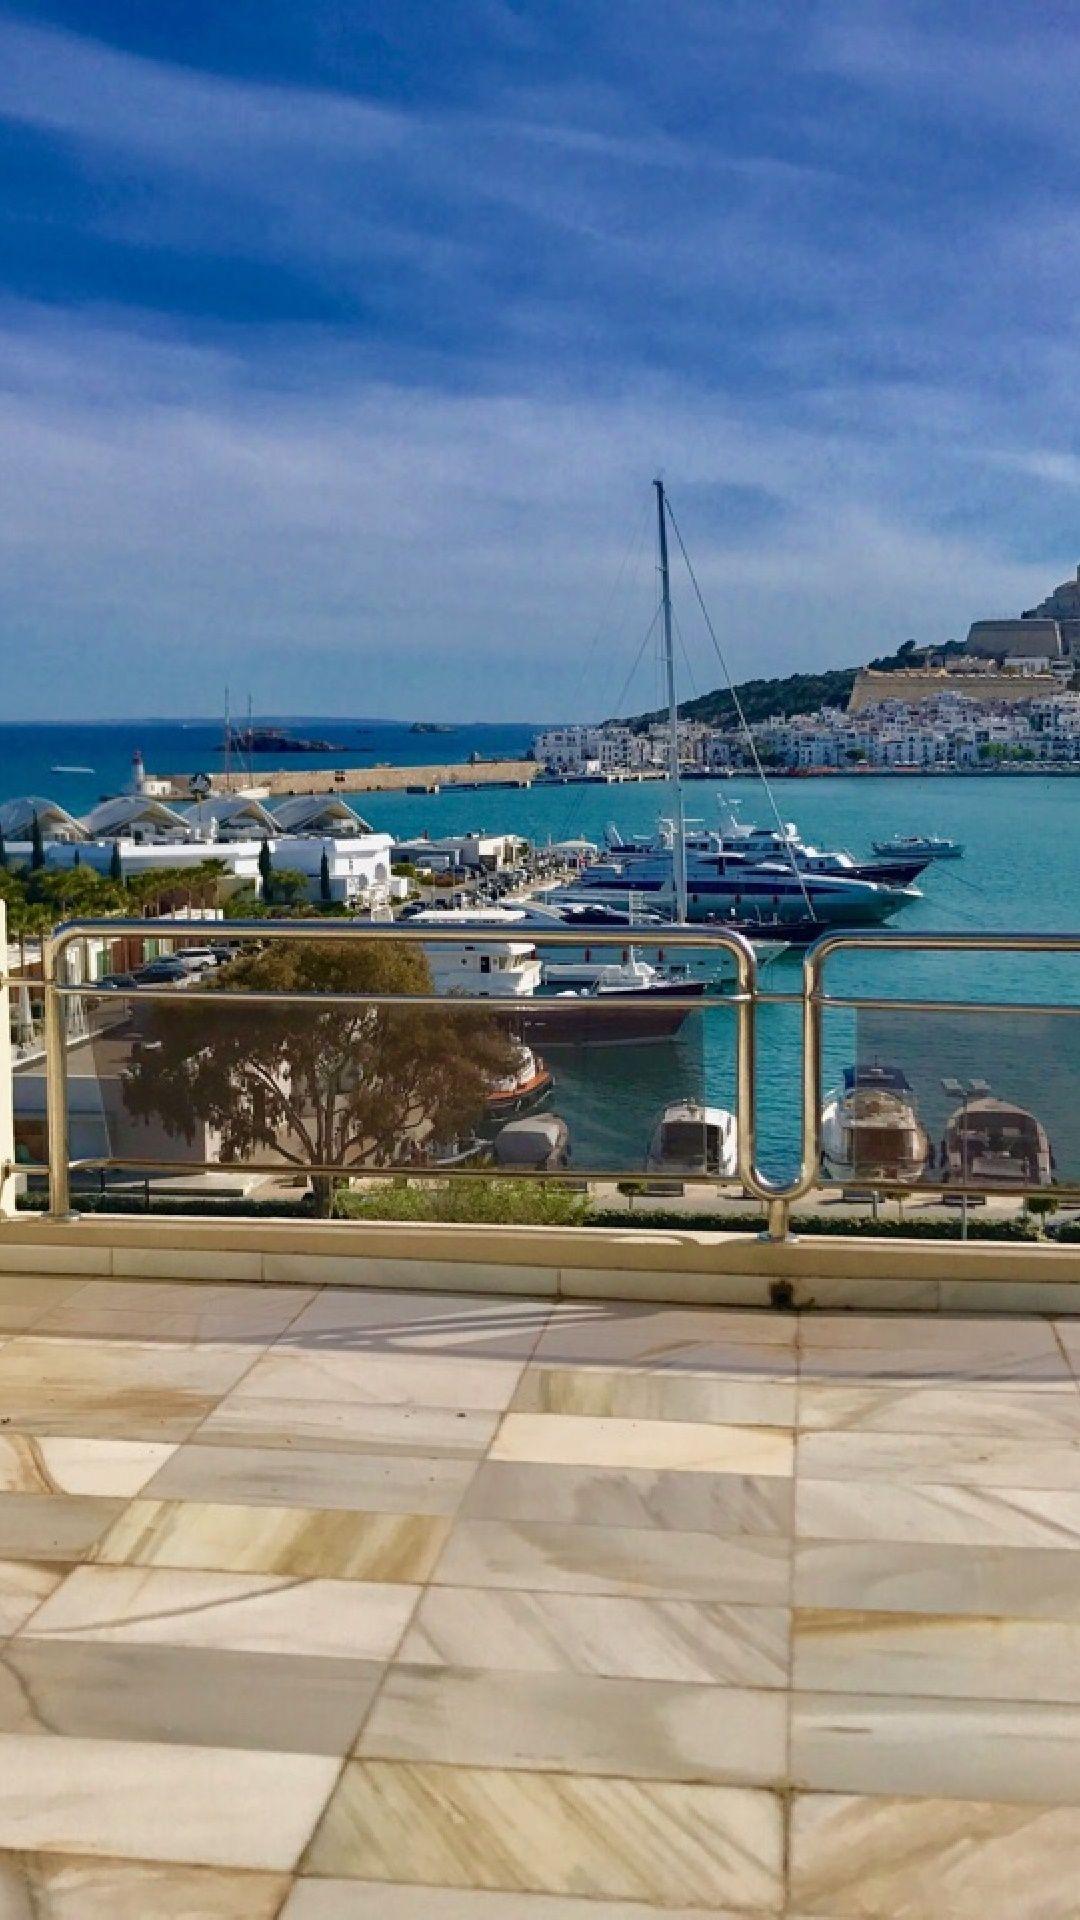 Ático en Ibiza, Marina Botafoch, venta